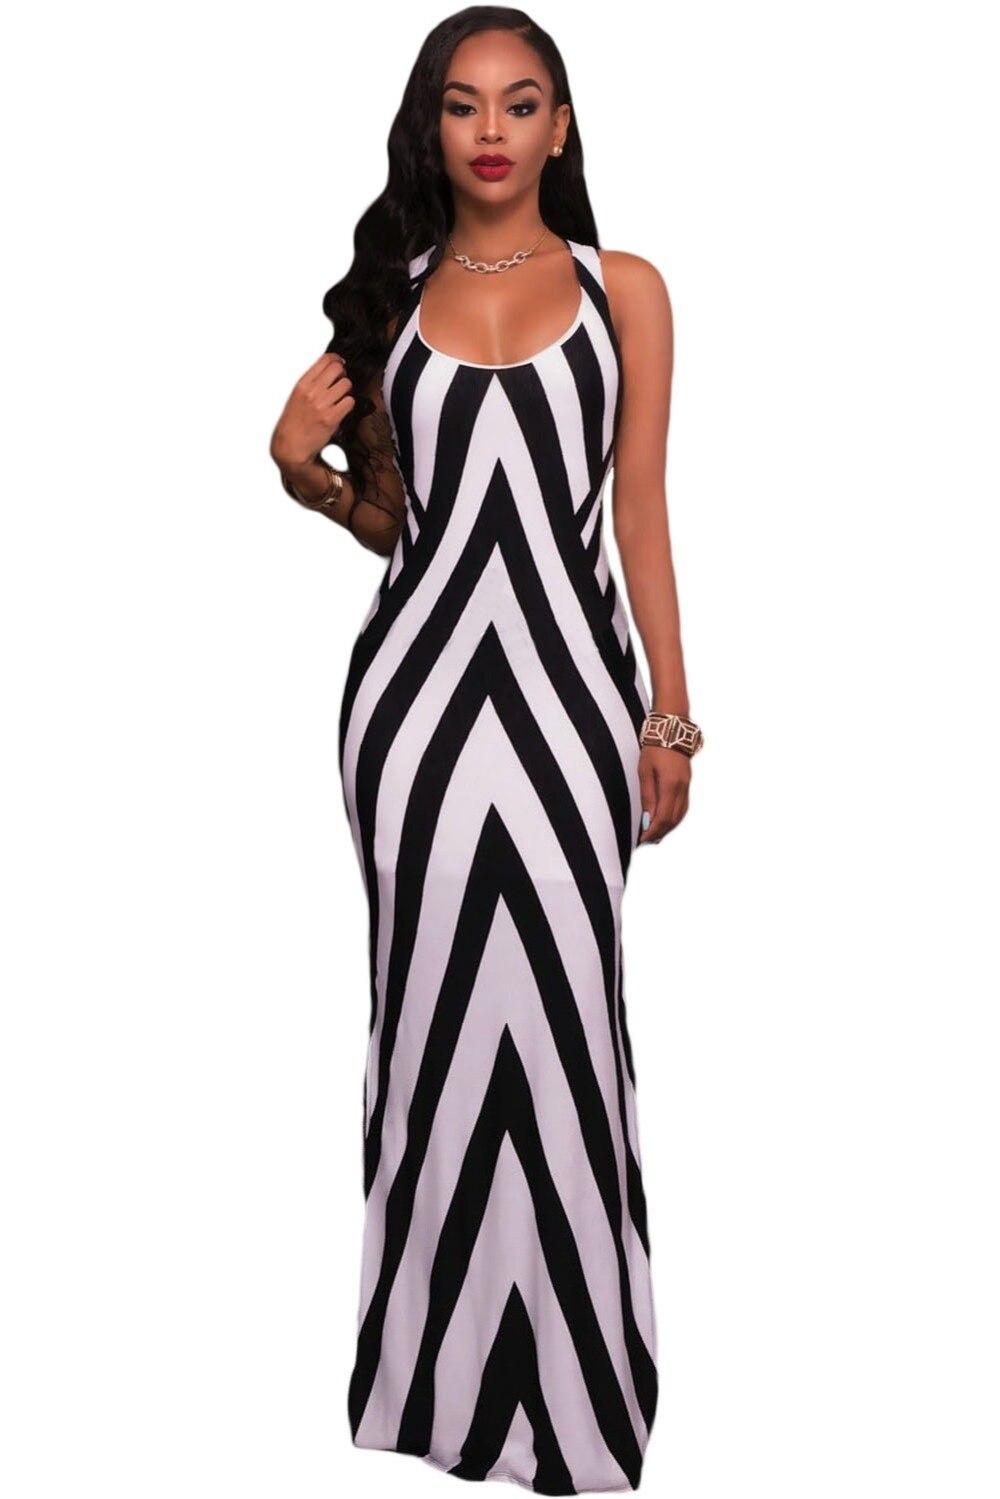 Terence Color Elegant Women Side Split Black And White Striped Maxi ...